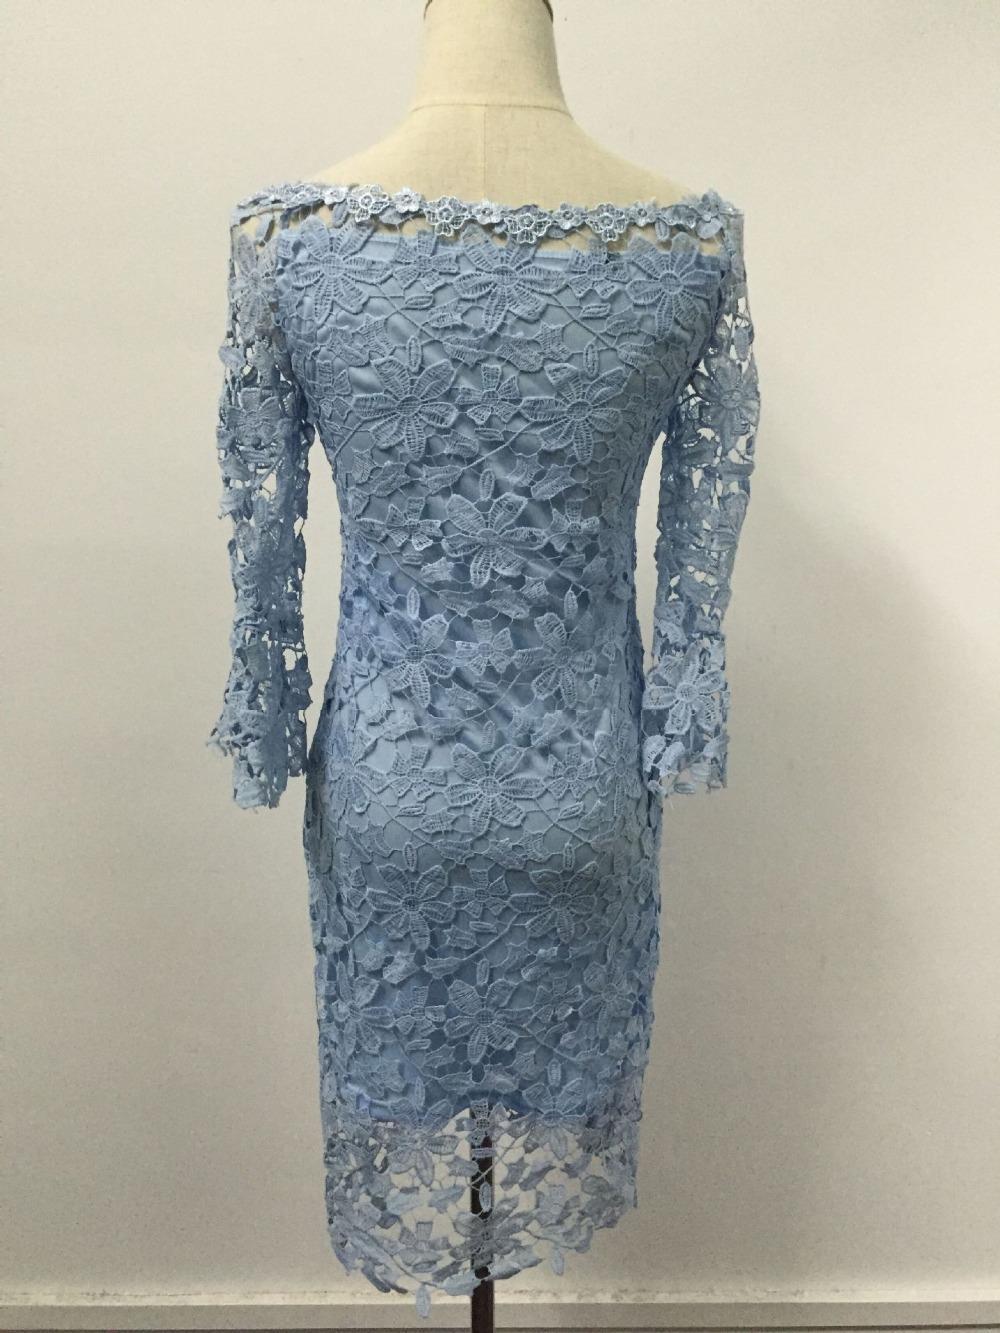 2018 New Arrivals sexy lace slash neck dress vestidos femininos Women 39 s Clothing Women dress in Dresses from Women 39 s Clothing